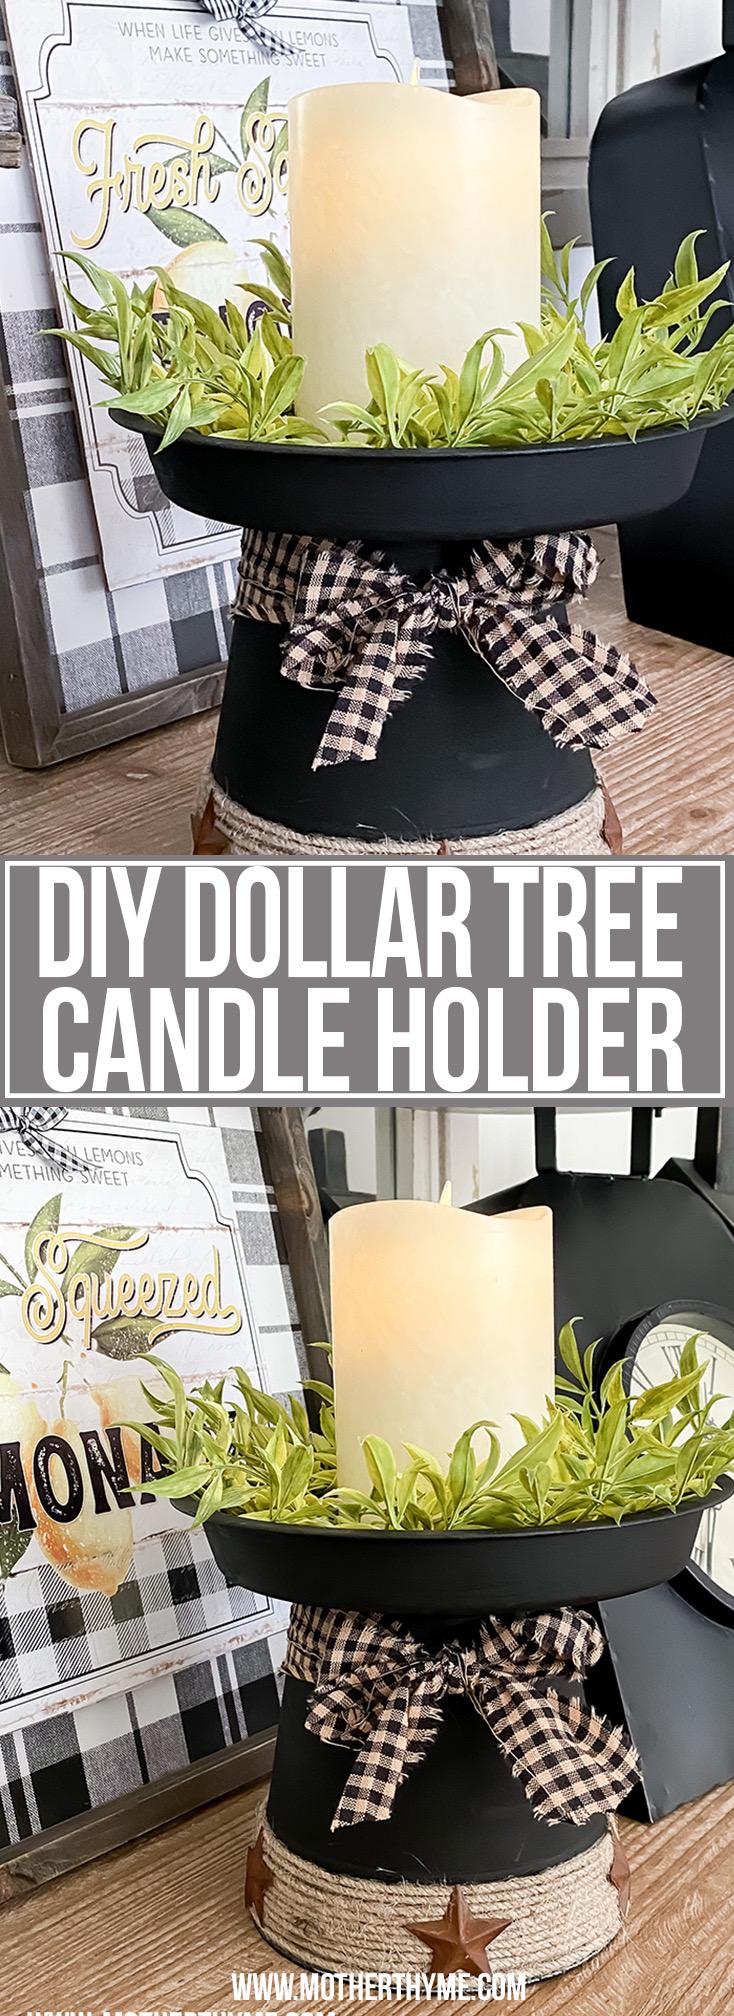 DIY DOLLAR TREE CANDLE HOLDER